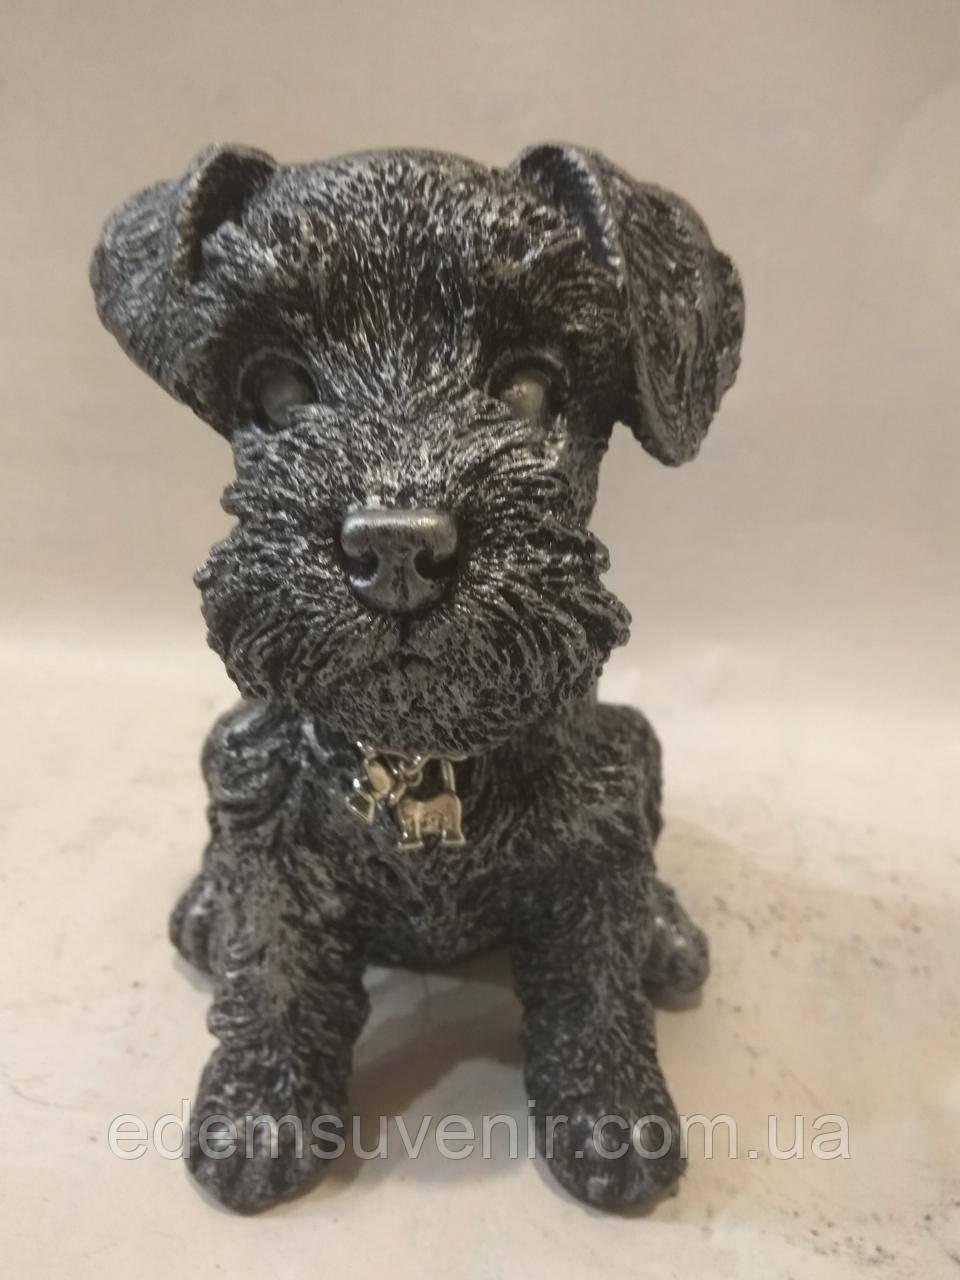 Статуэтка (копилка) щенок Шнауцера серебро